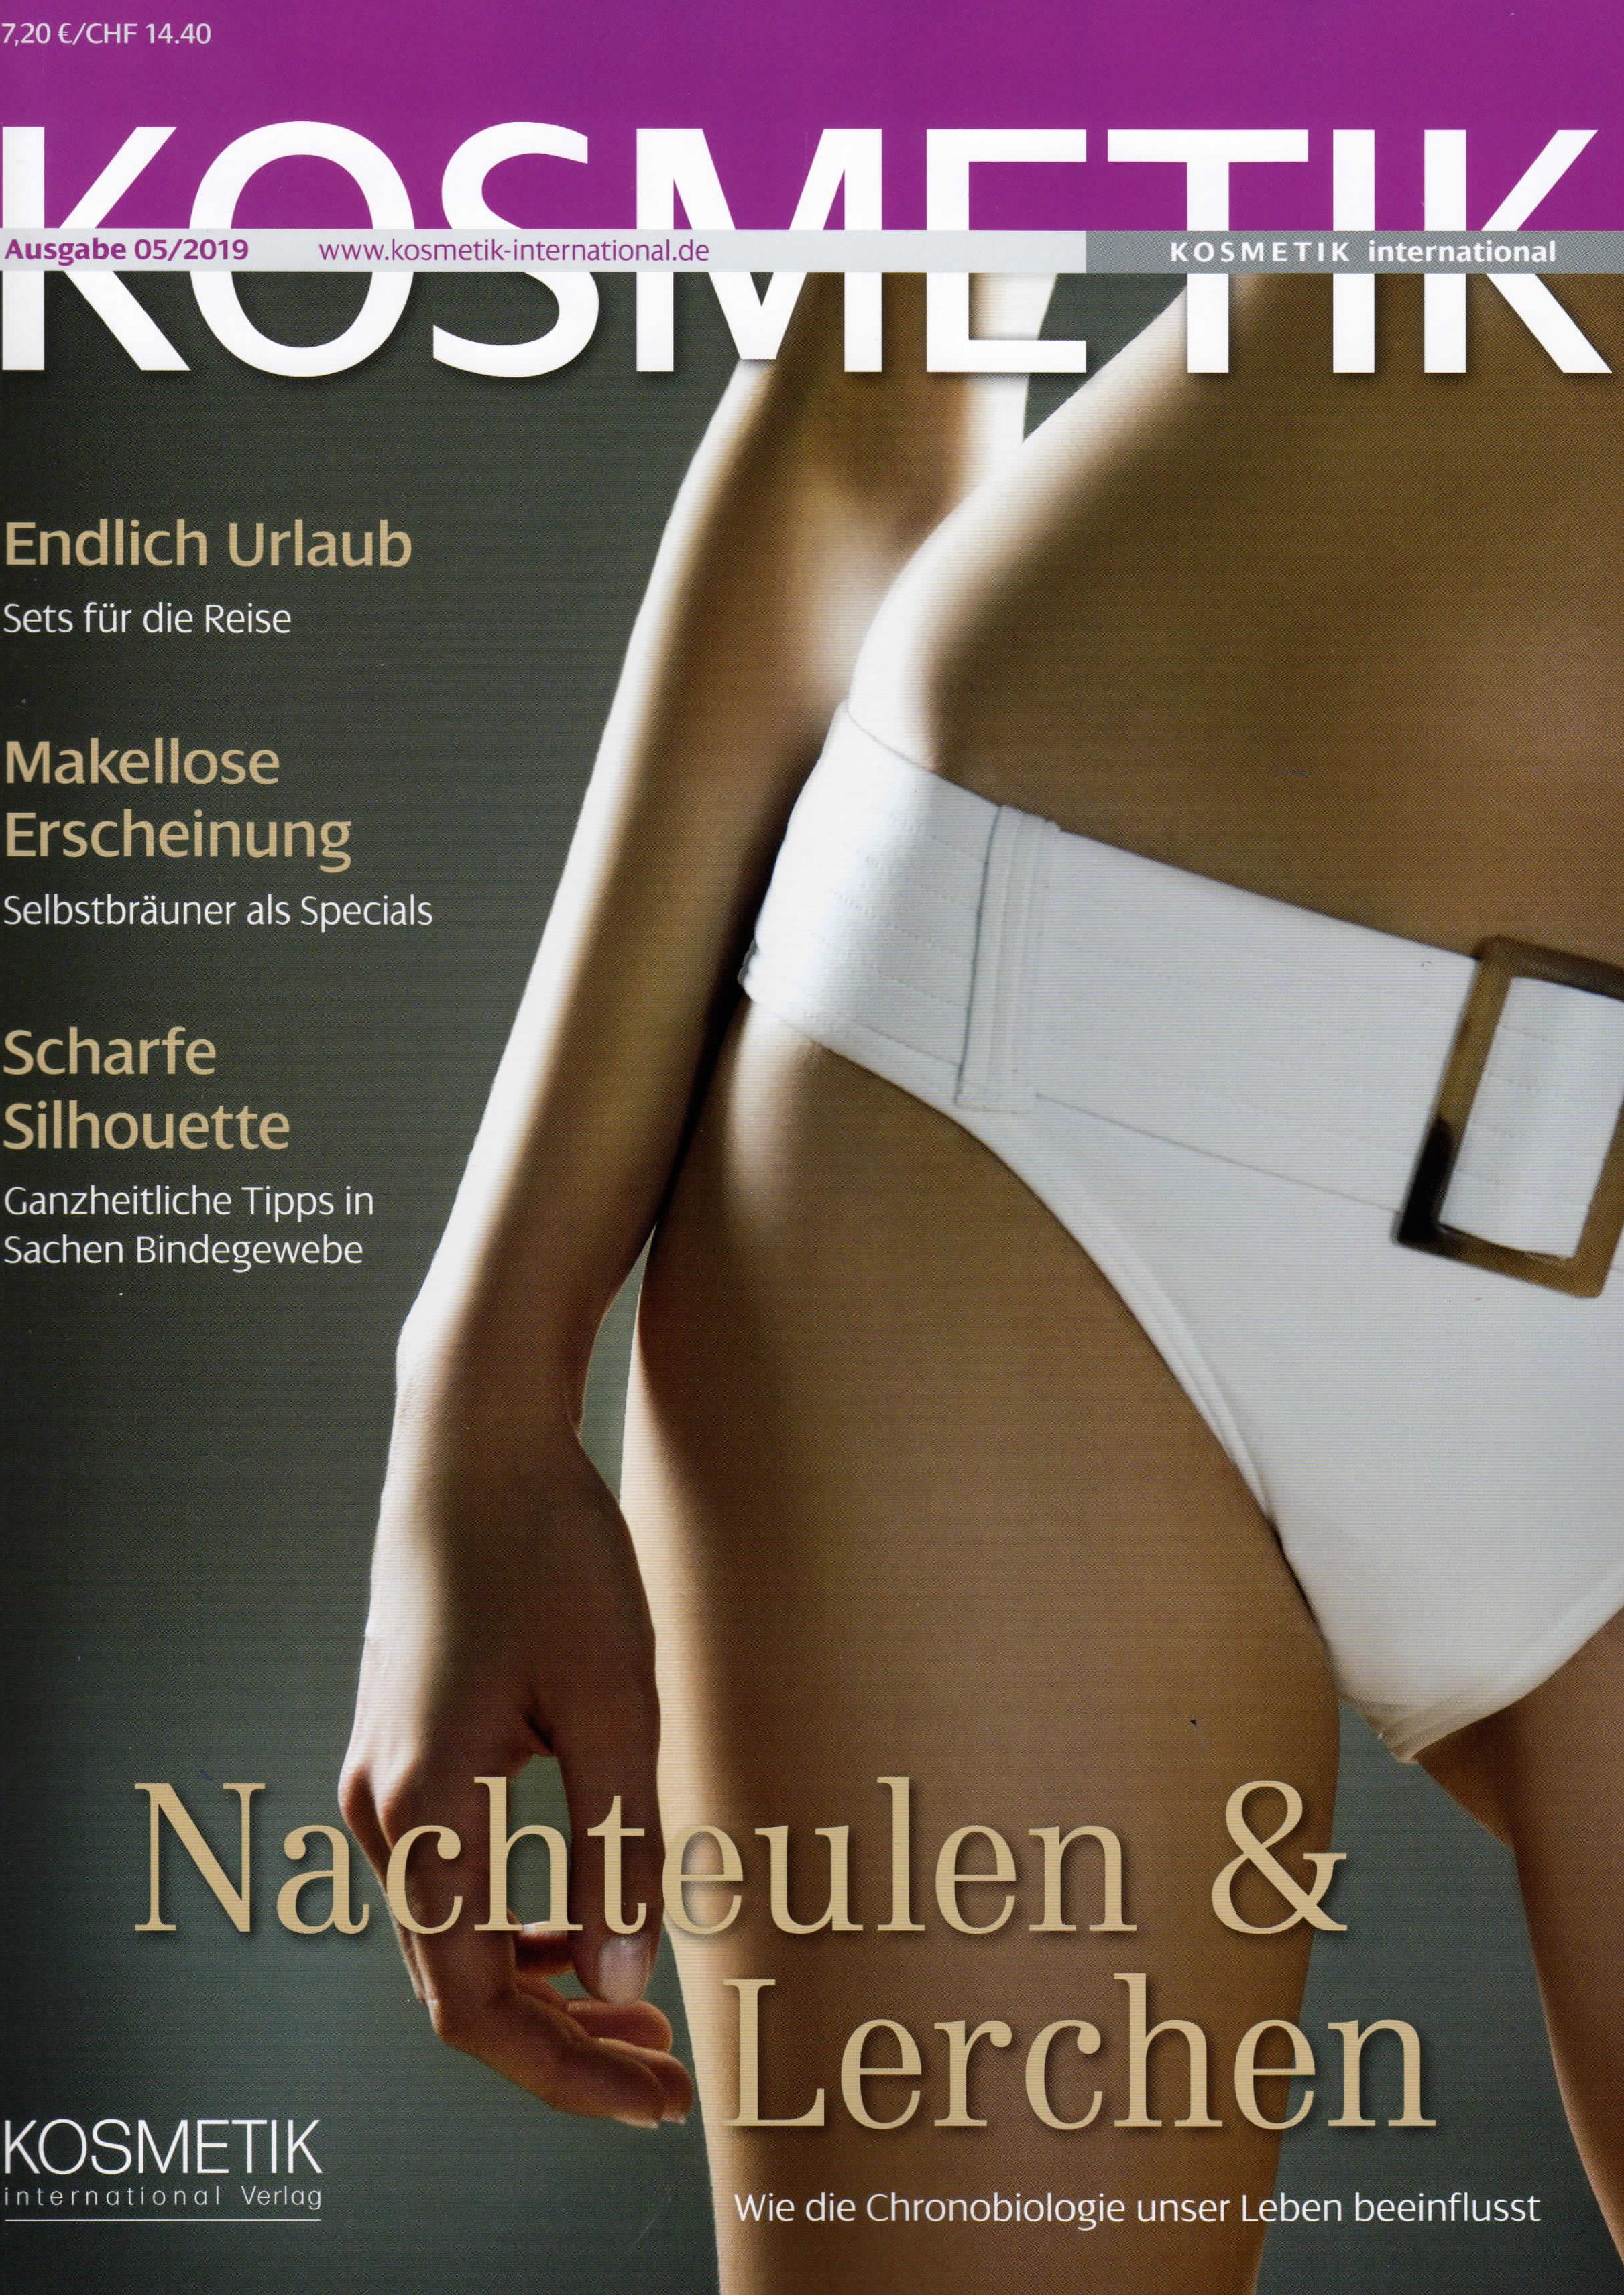 Neuer Look, Gegen Cellulite, Kosmetik im Mai 2019